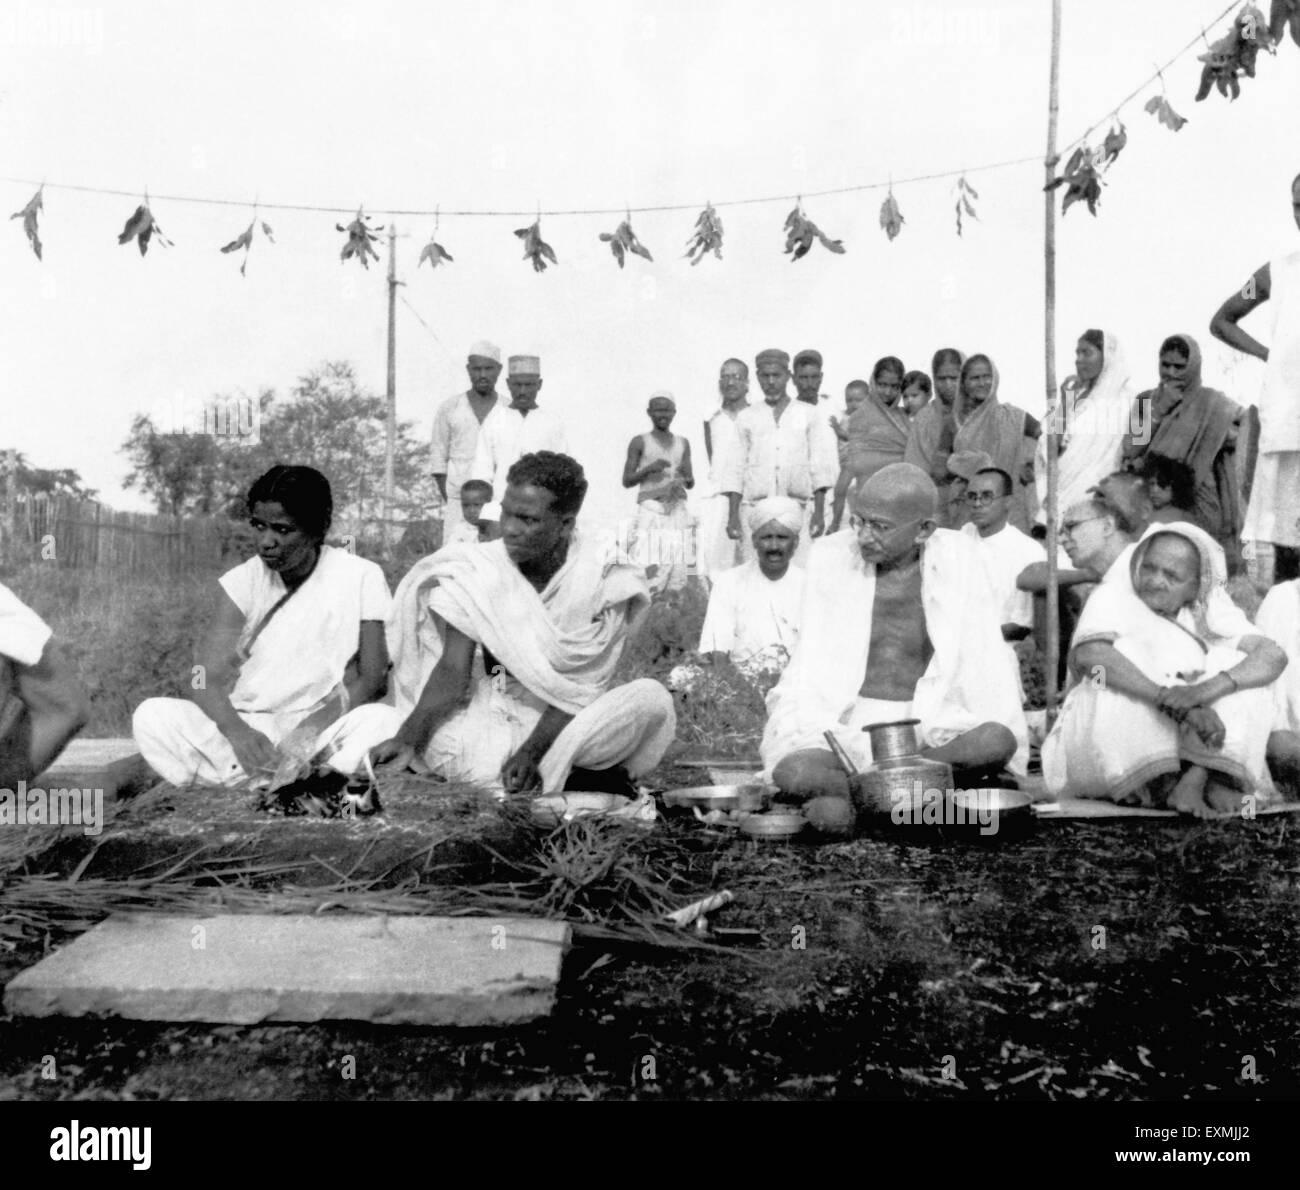 gandhi on untouchability